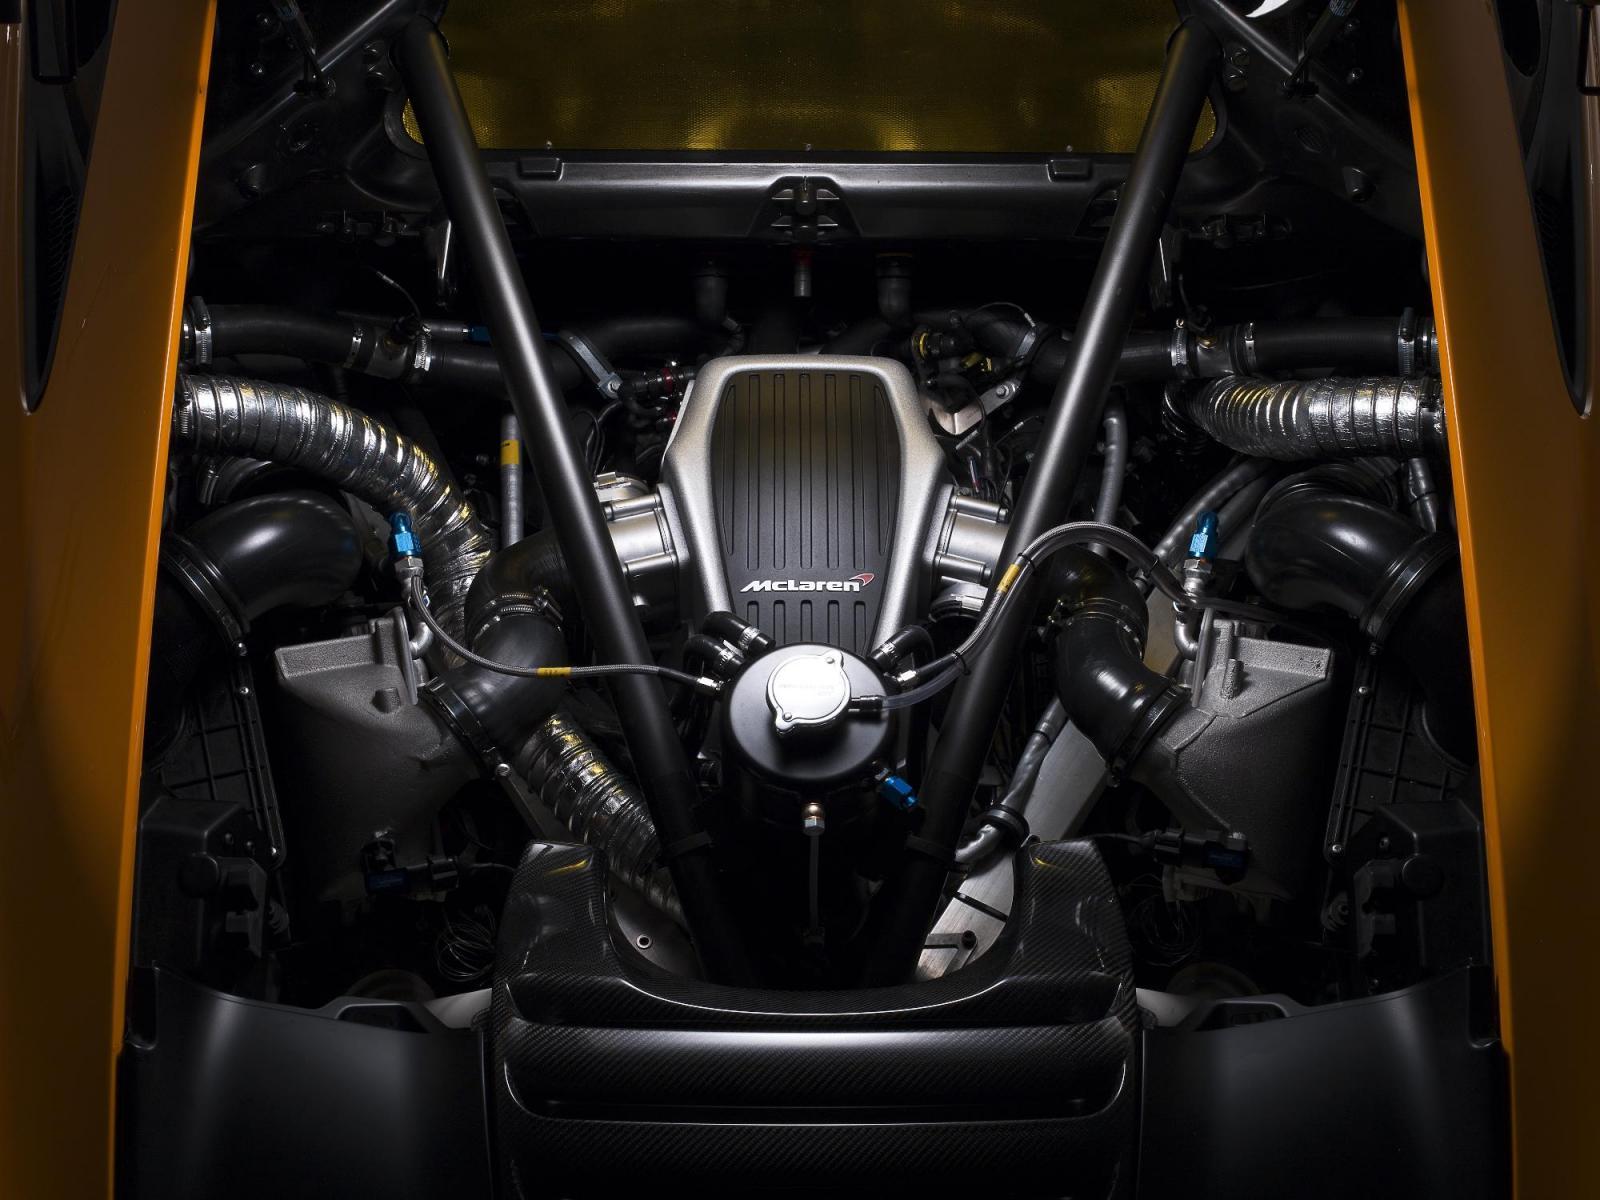 http://images.caradisiac.com/images/0/3/5/5/80355/S0-McLaren-MP4-12C-Cam-Am-Edition-Racing-Concept-268715.jpg